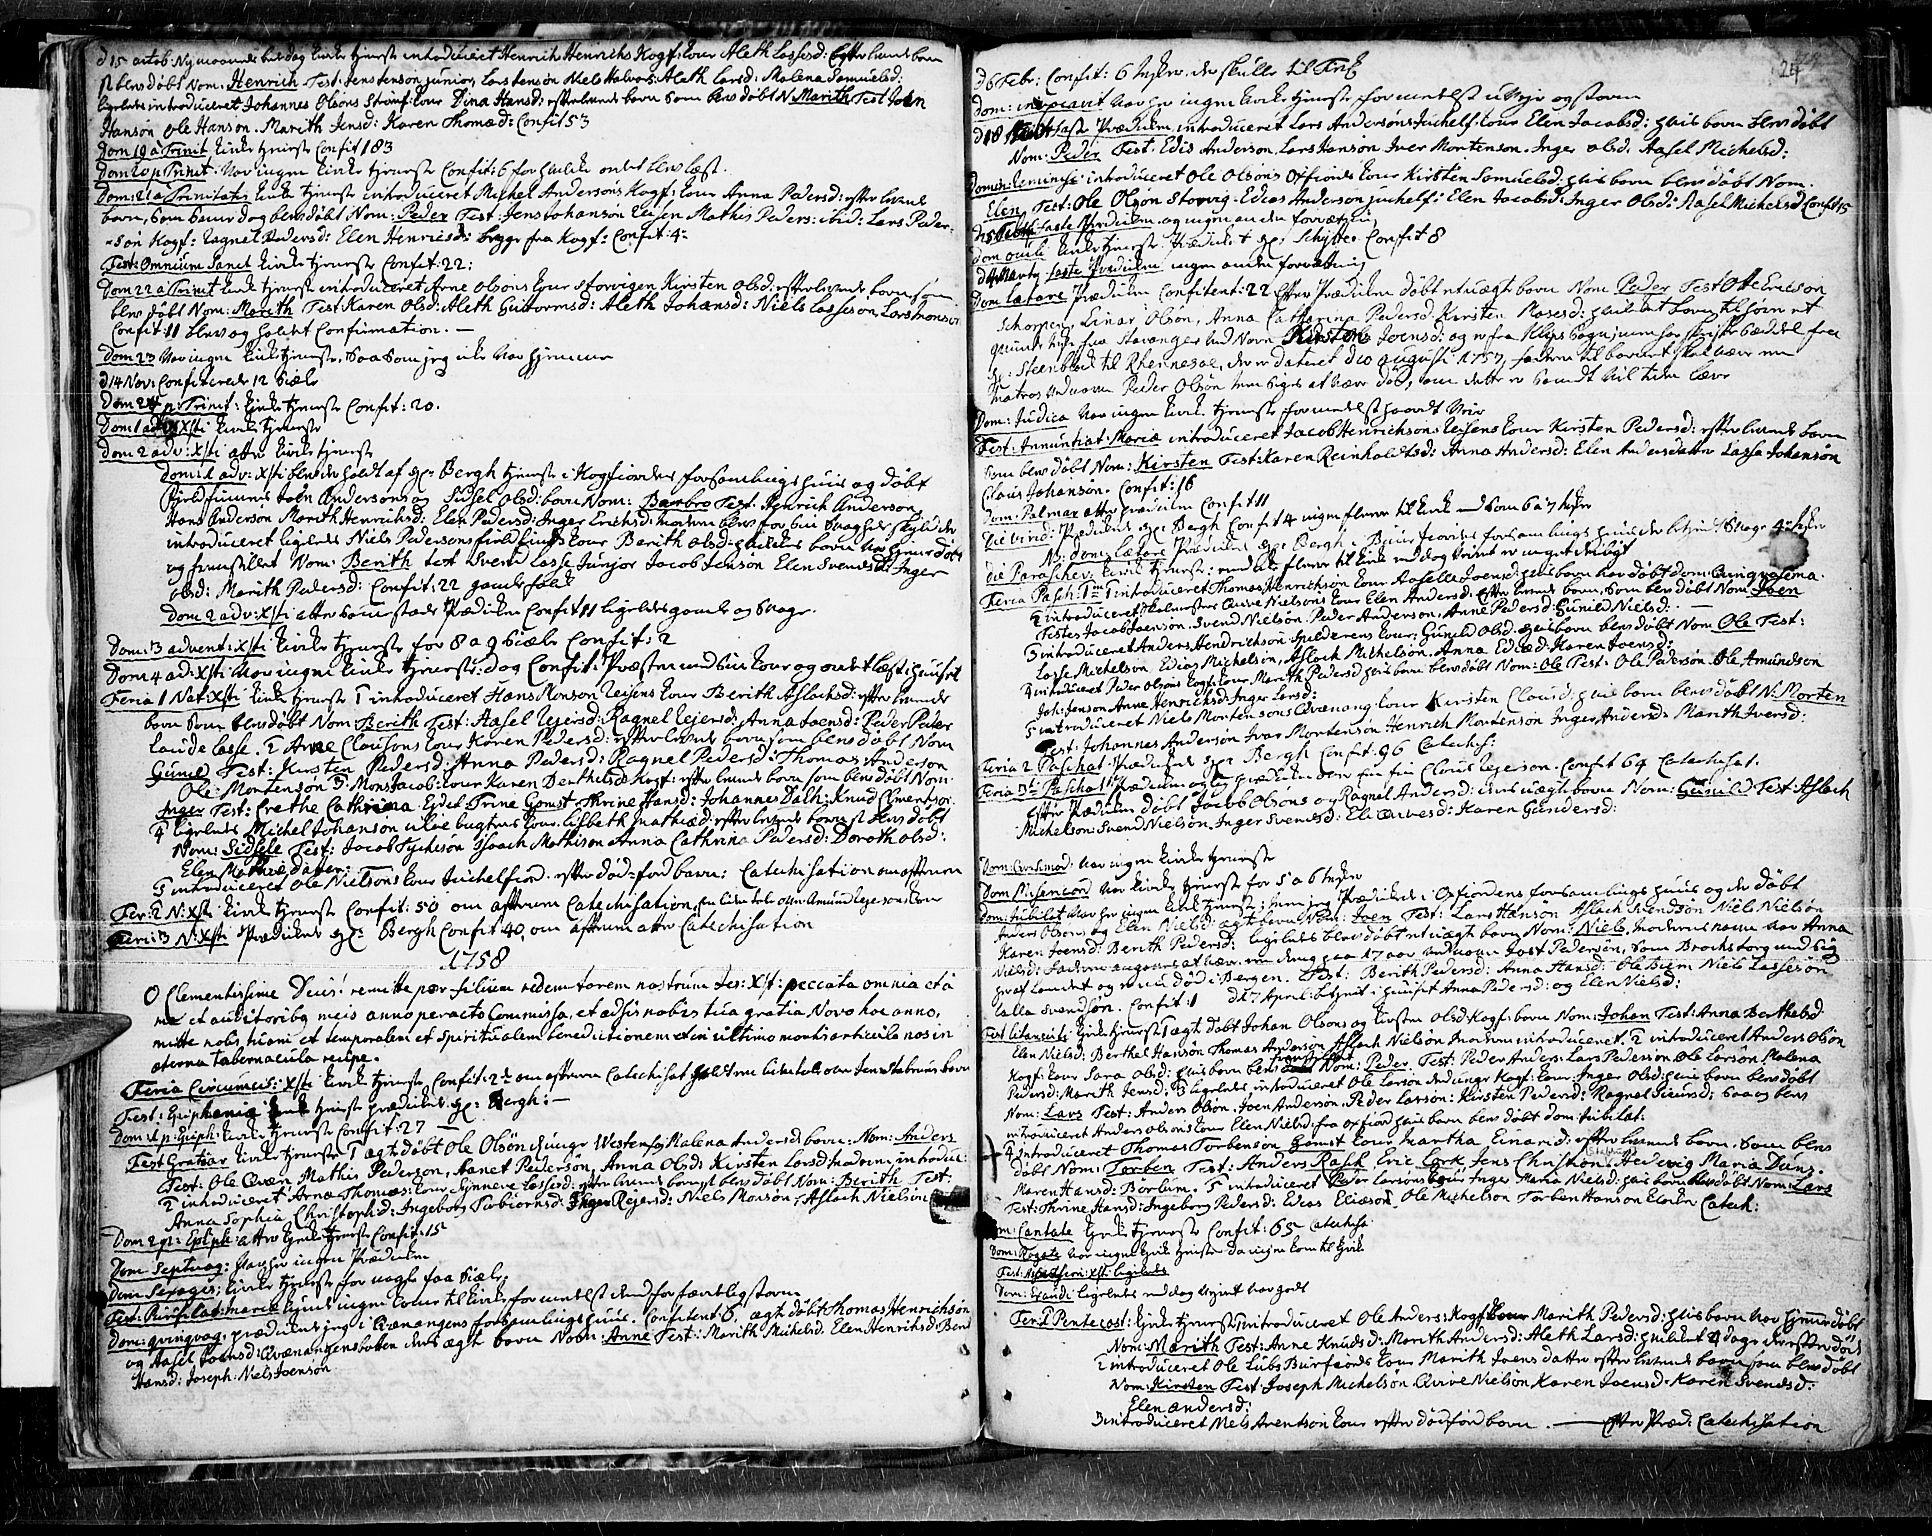 SATØ, Skjervøy sokneprestkontor, H/Ha/Haa/L0001kirke: Ministerialbok nr. 1, 1748-1780, s. 24